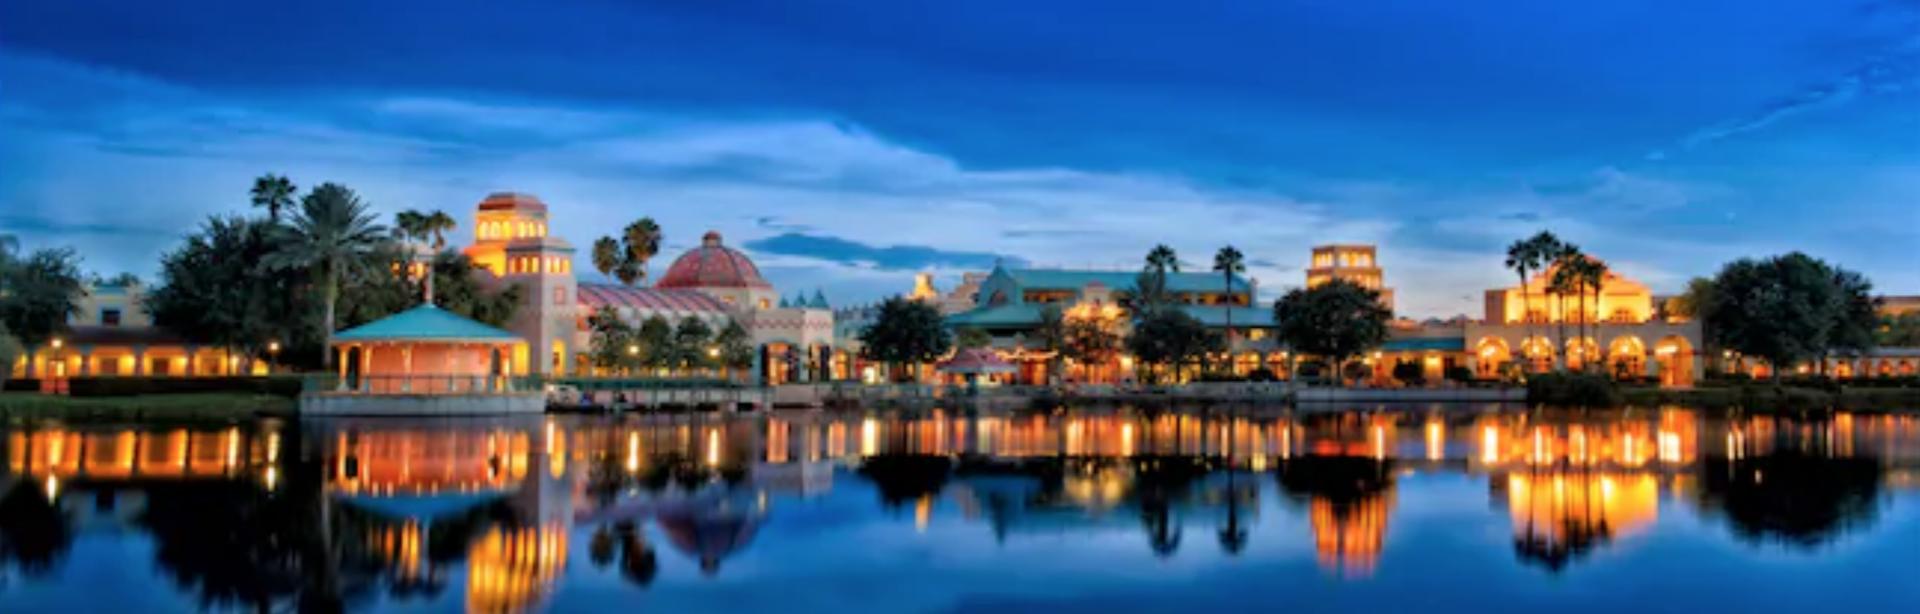 Disney Coronado Springs Resort